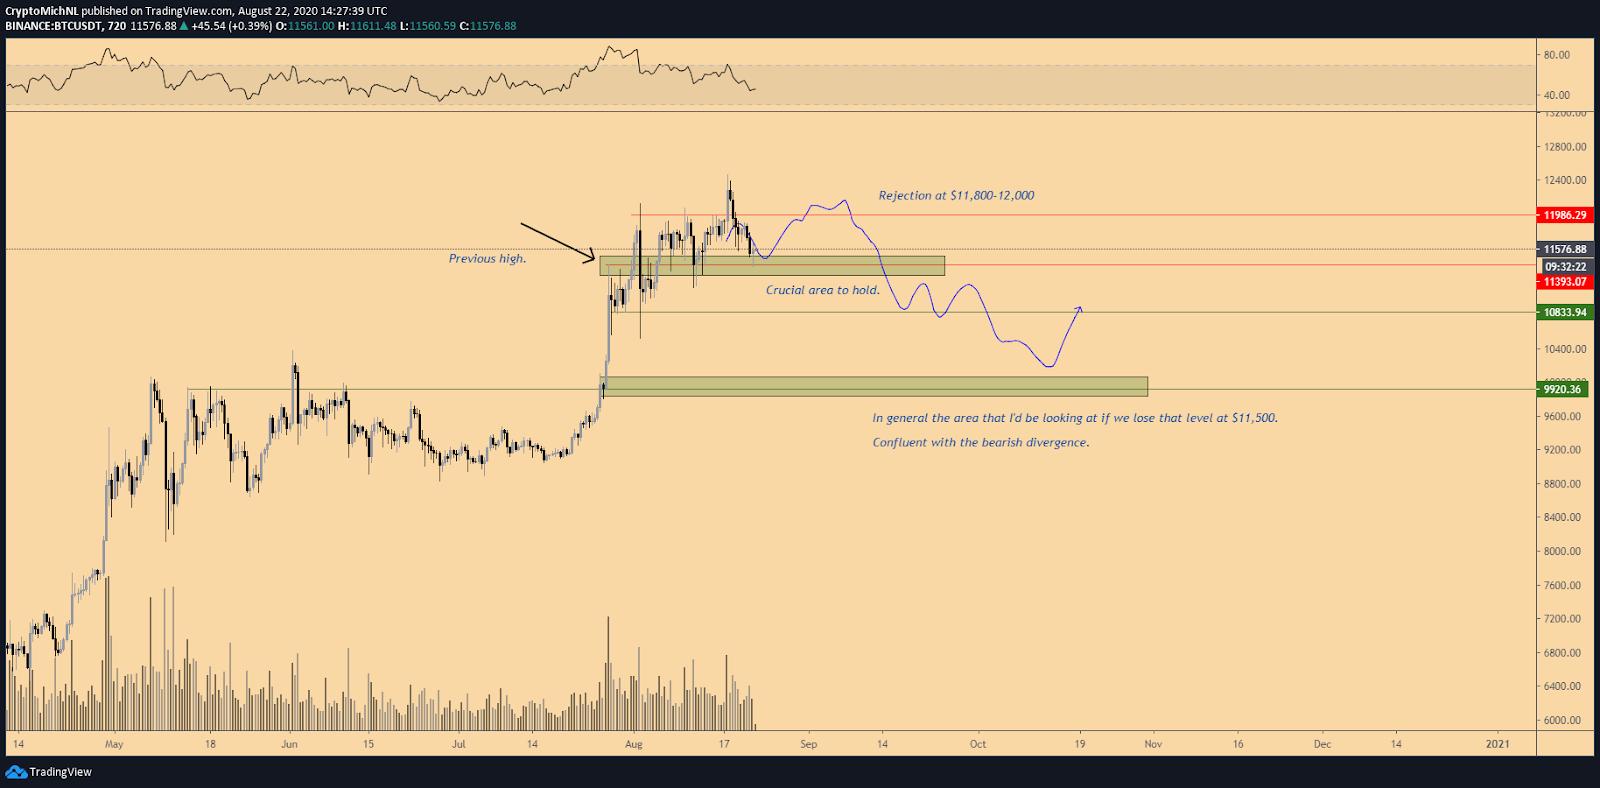 BTC/USDT 12-hour bearish scenario chart. Source: TradingView